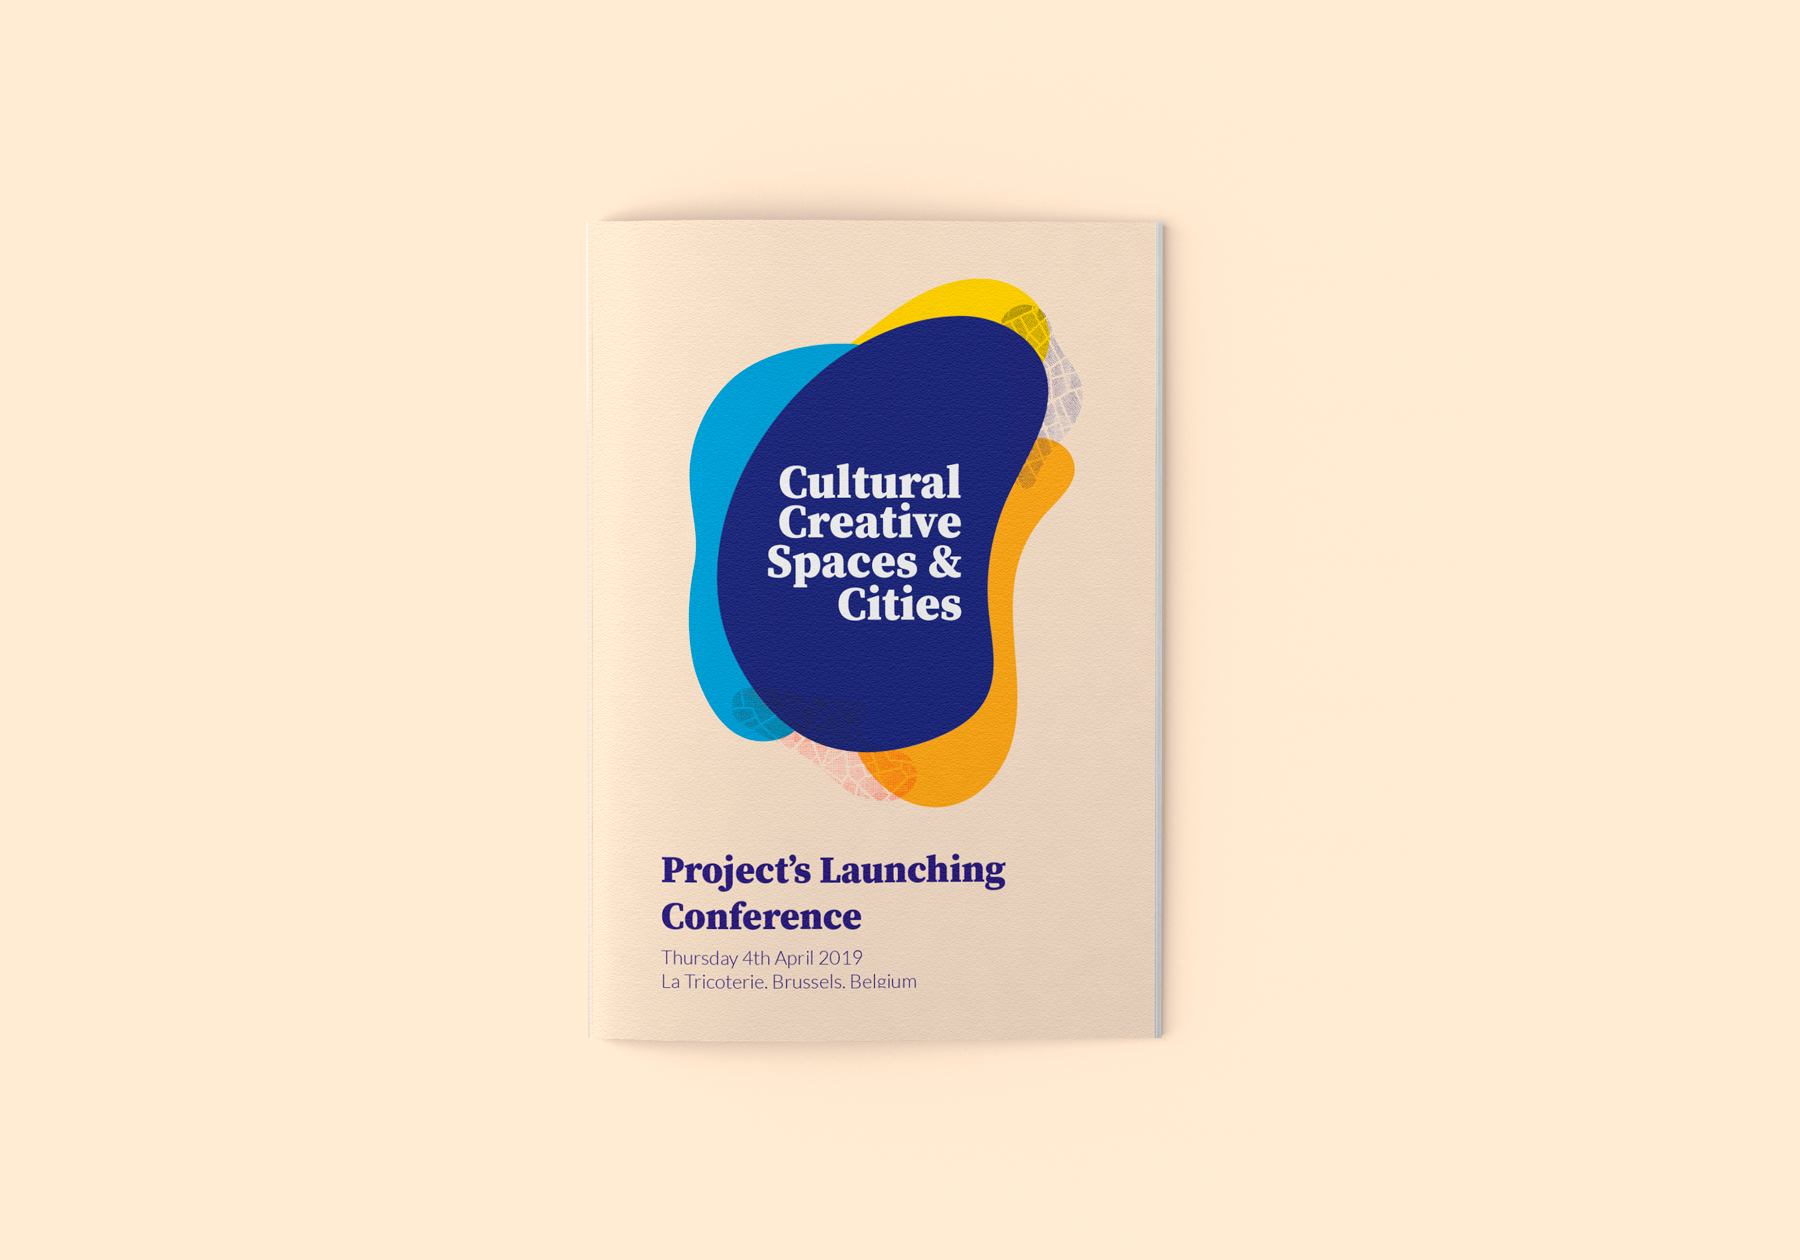 Cultural Creative Spaces & Cities konferensbroschyr